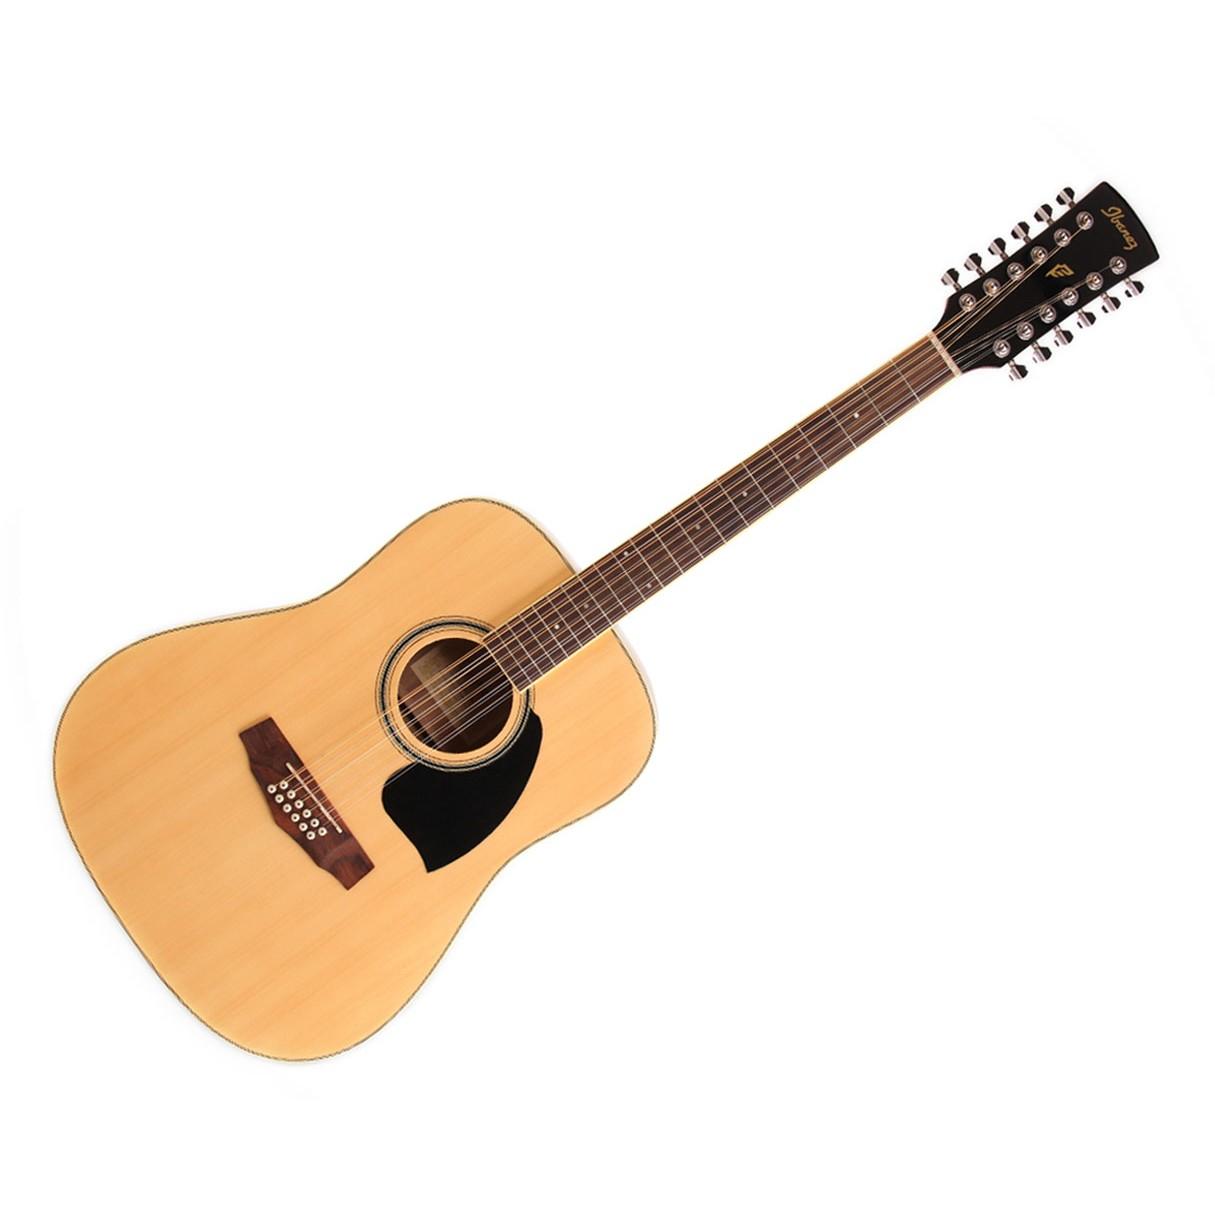 ibanez pf1512 dreadnought acoustic guitar 12 string natural. Black Bedroom Furniture Sets. Home Design Ideas